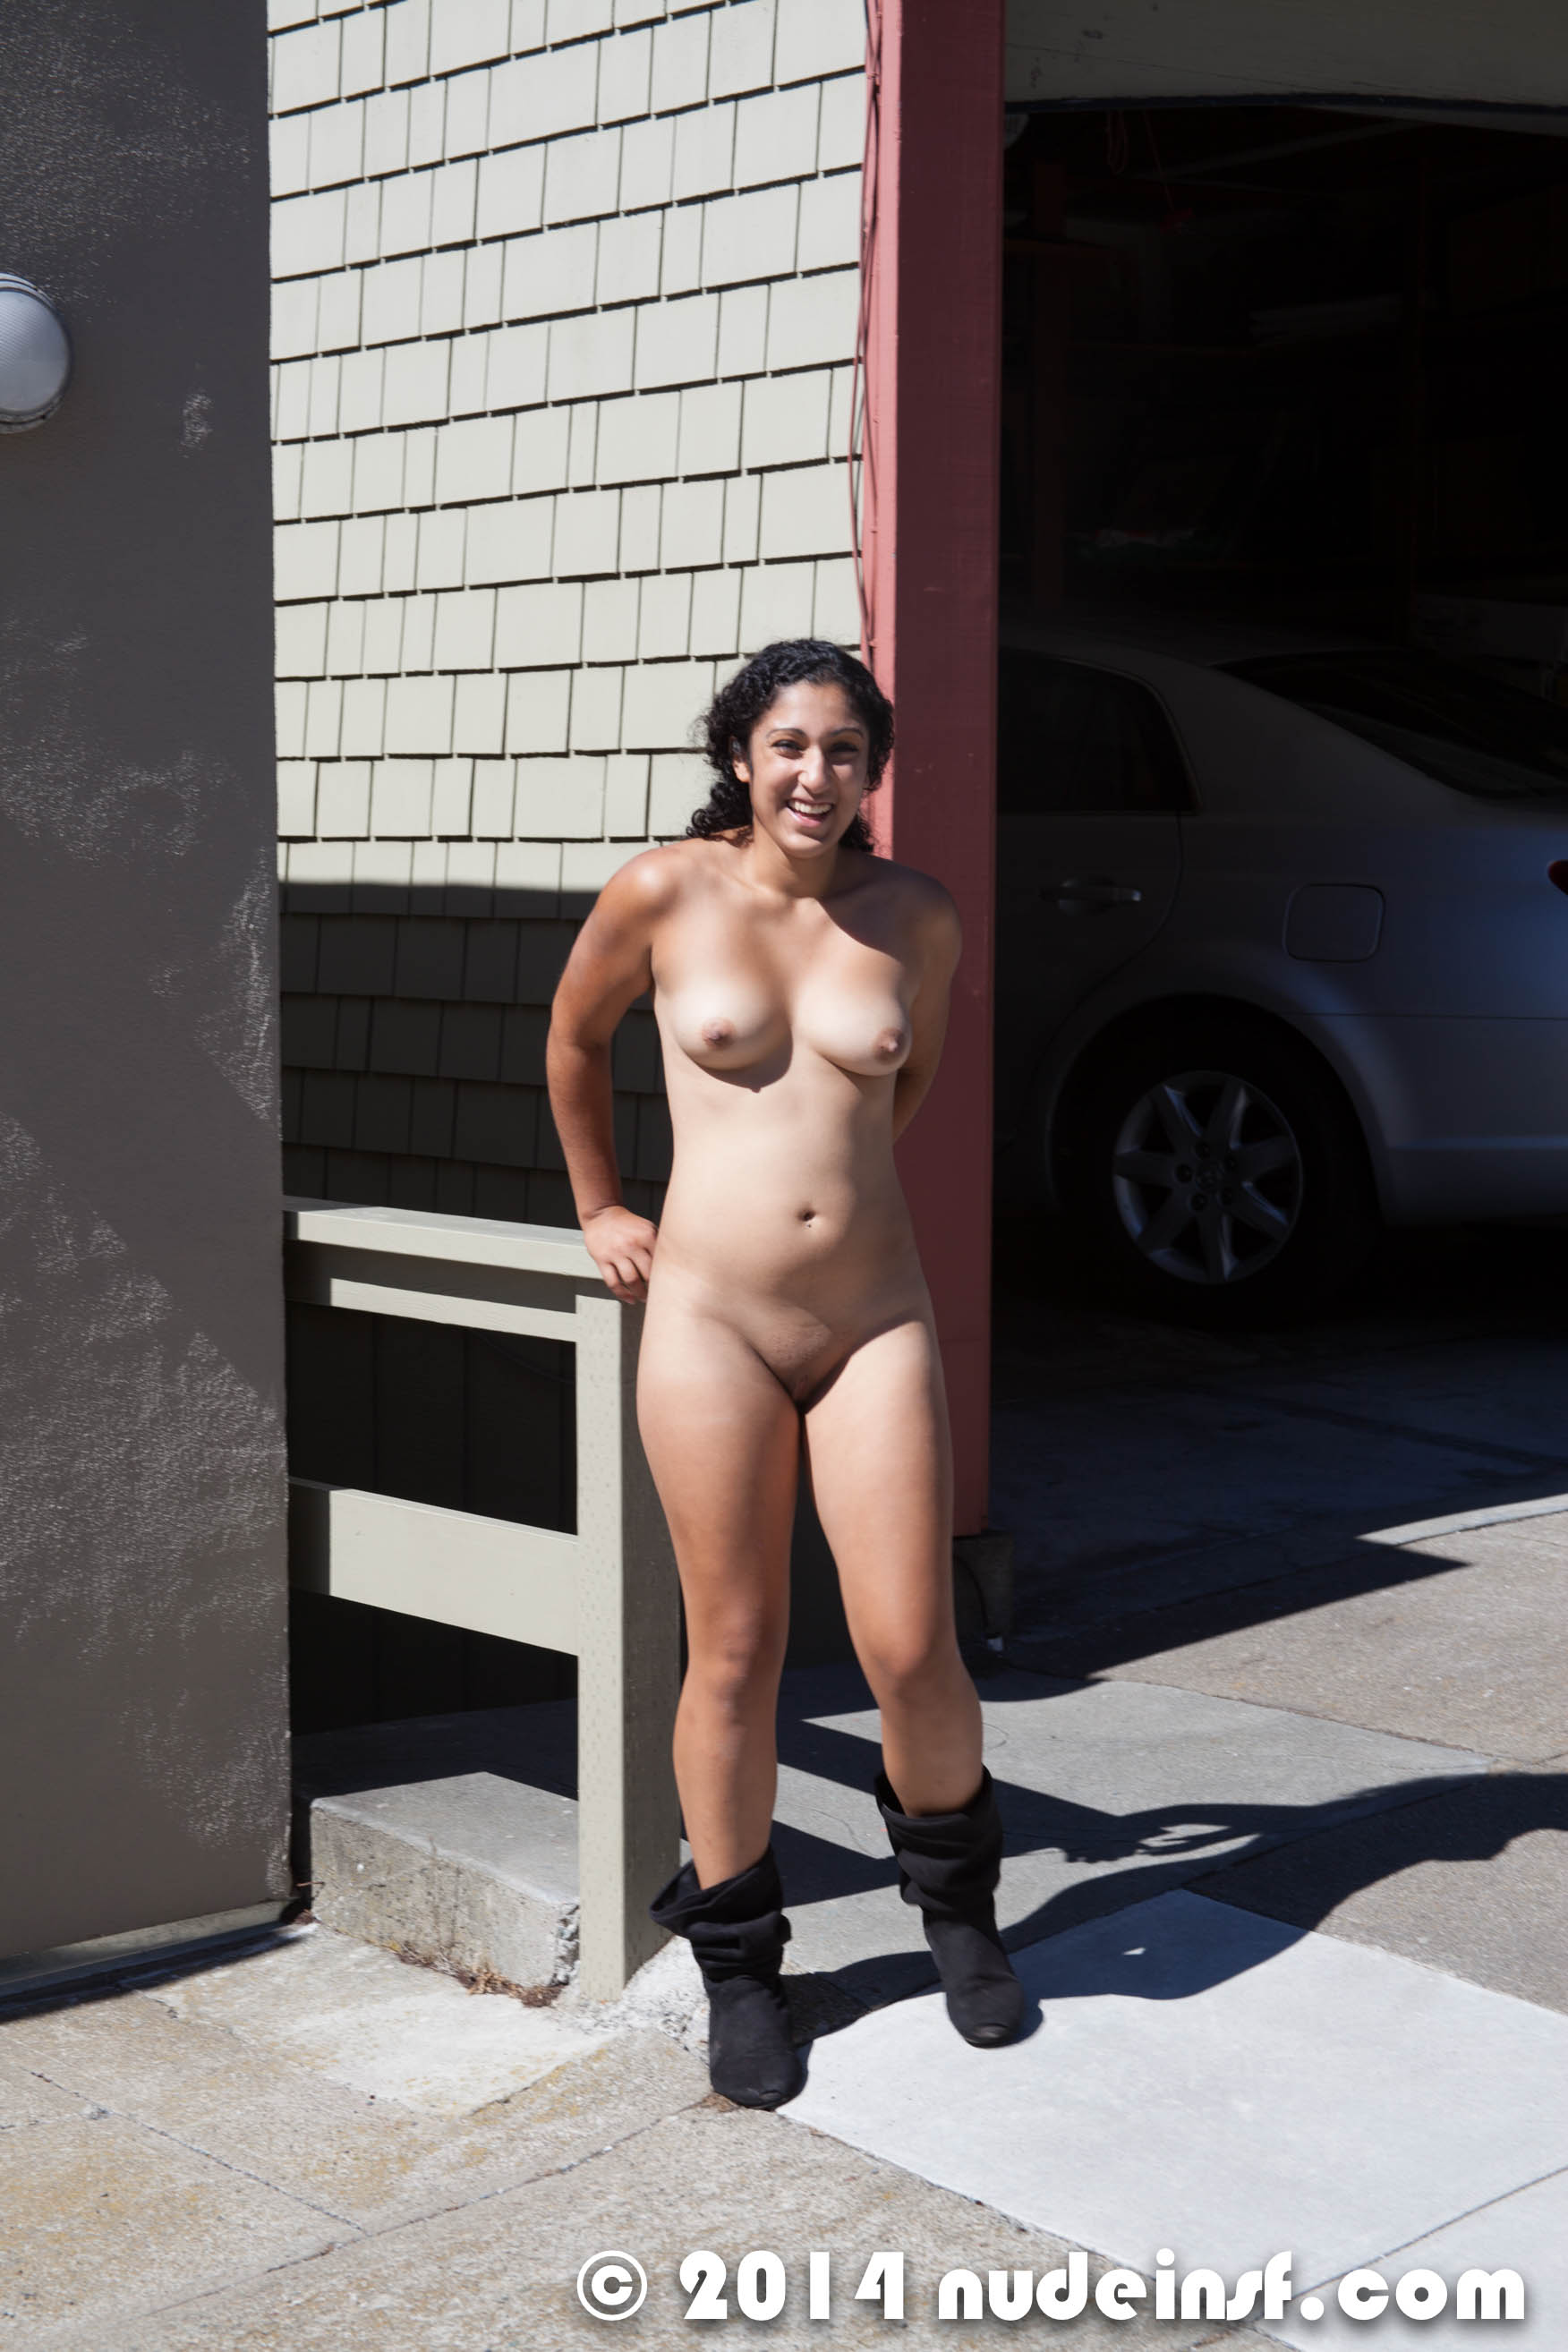 Naked sexy girls dennisville new jersey